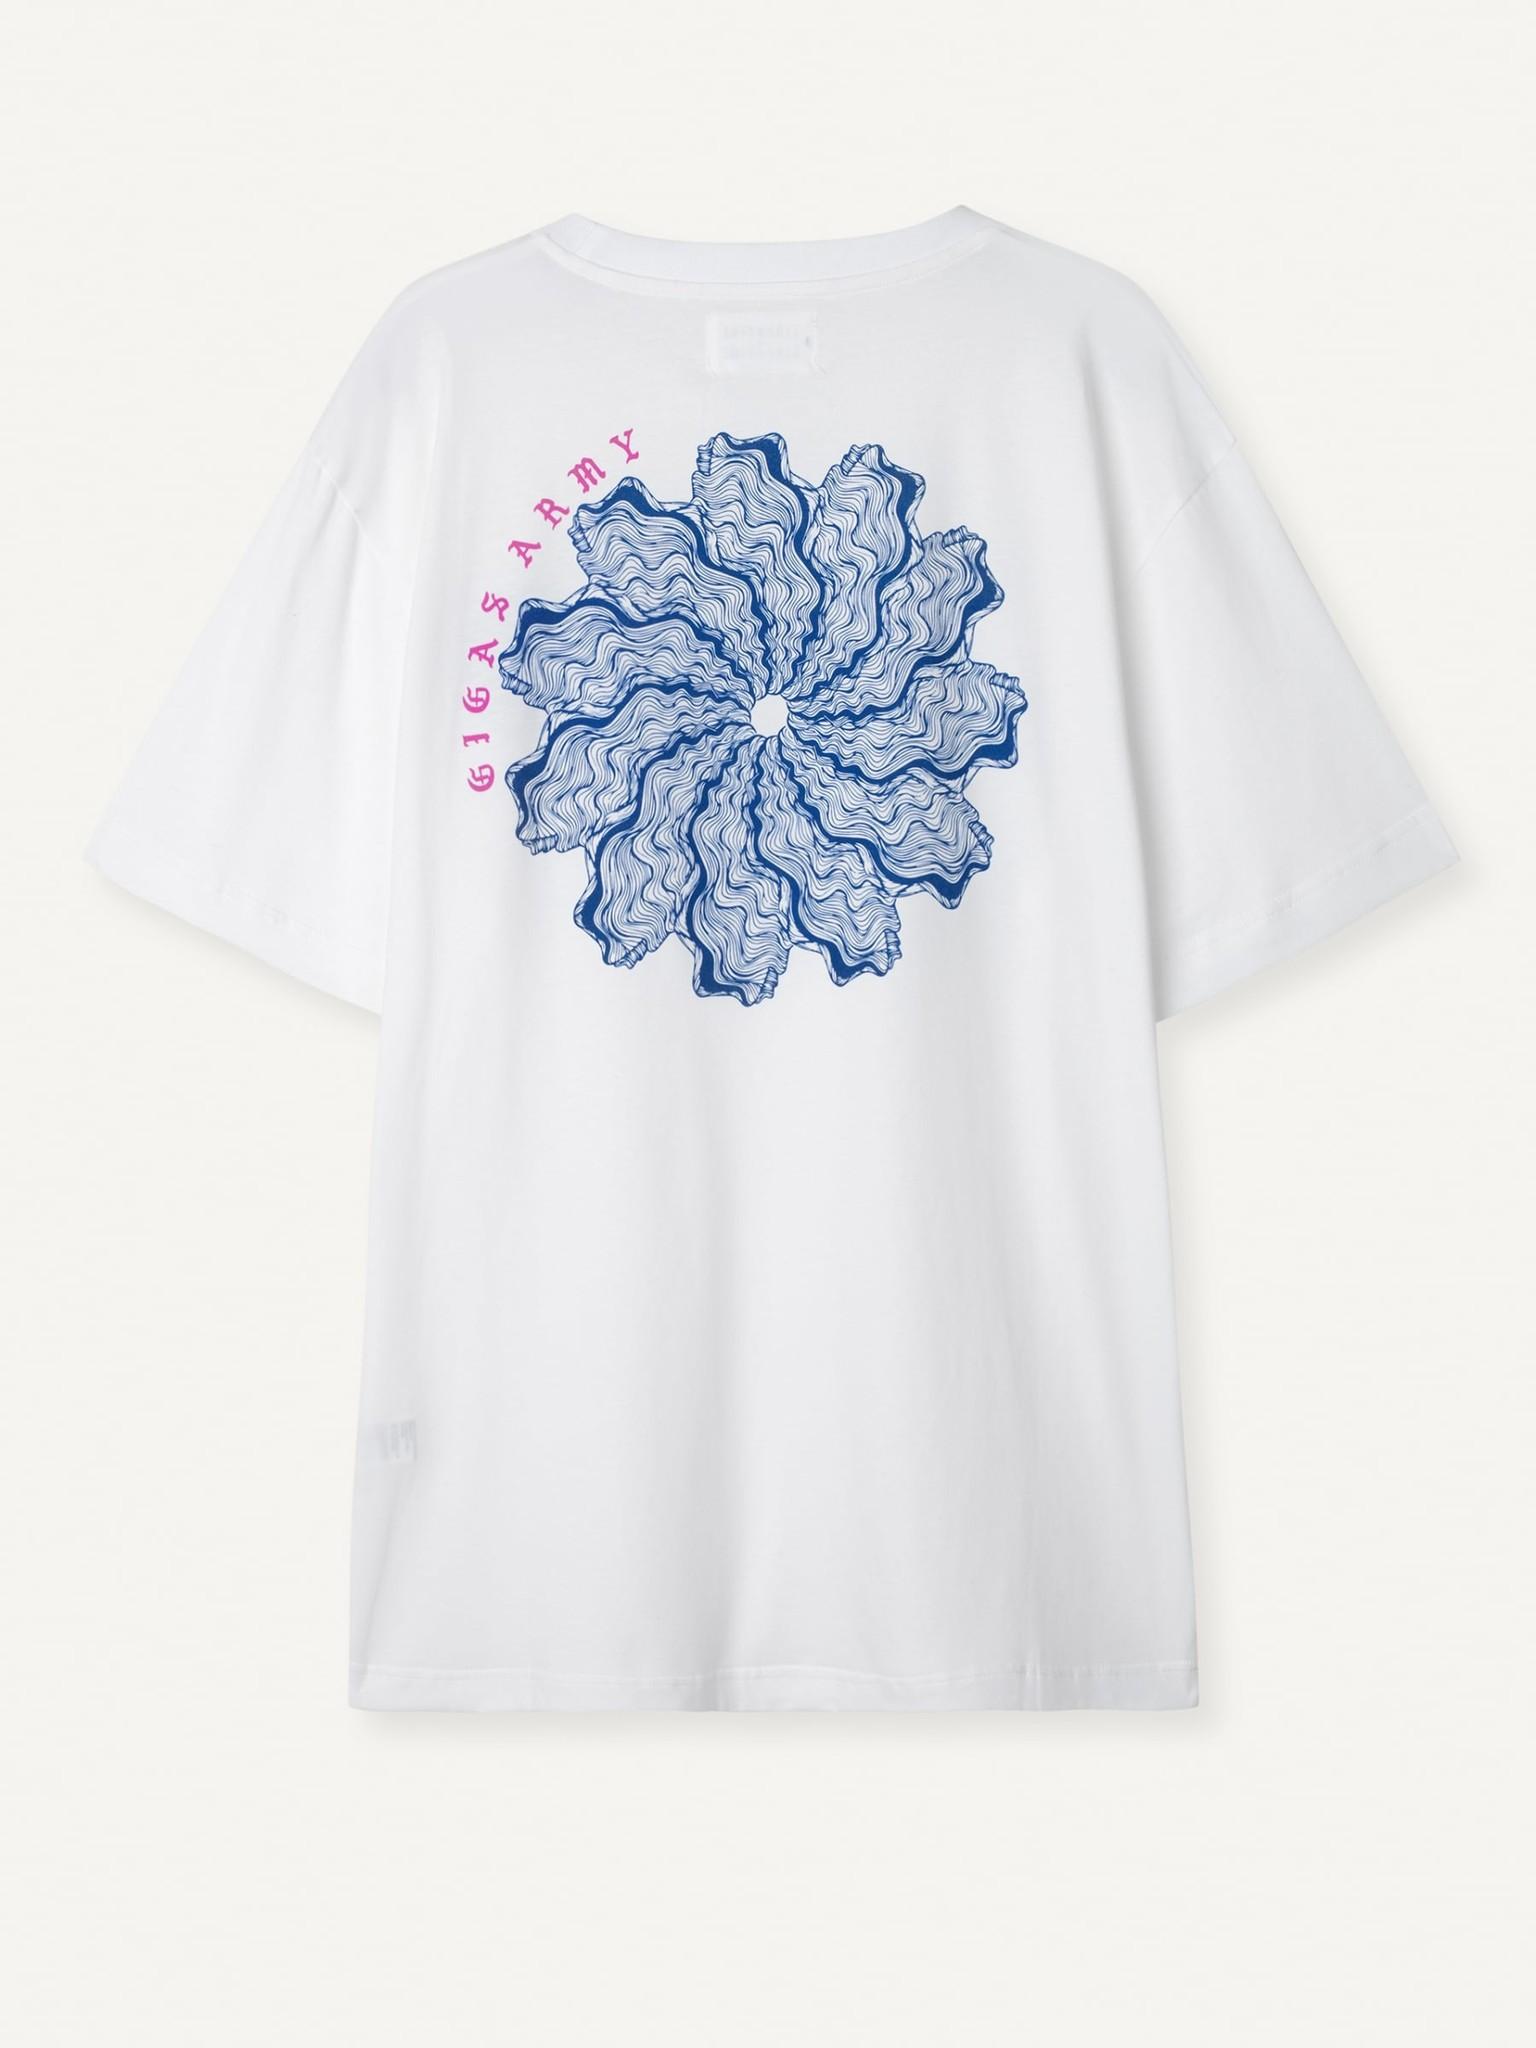 Beat Gigas Army T-Shirt White-1